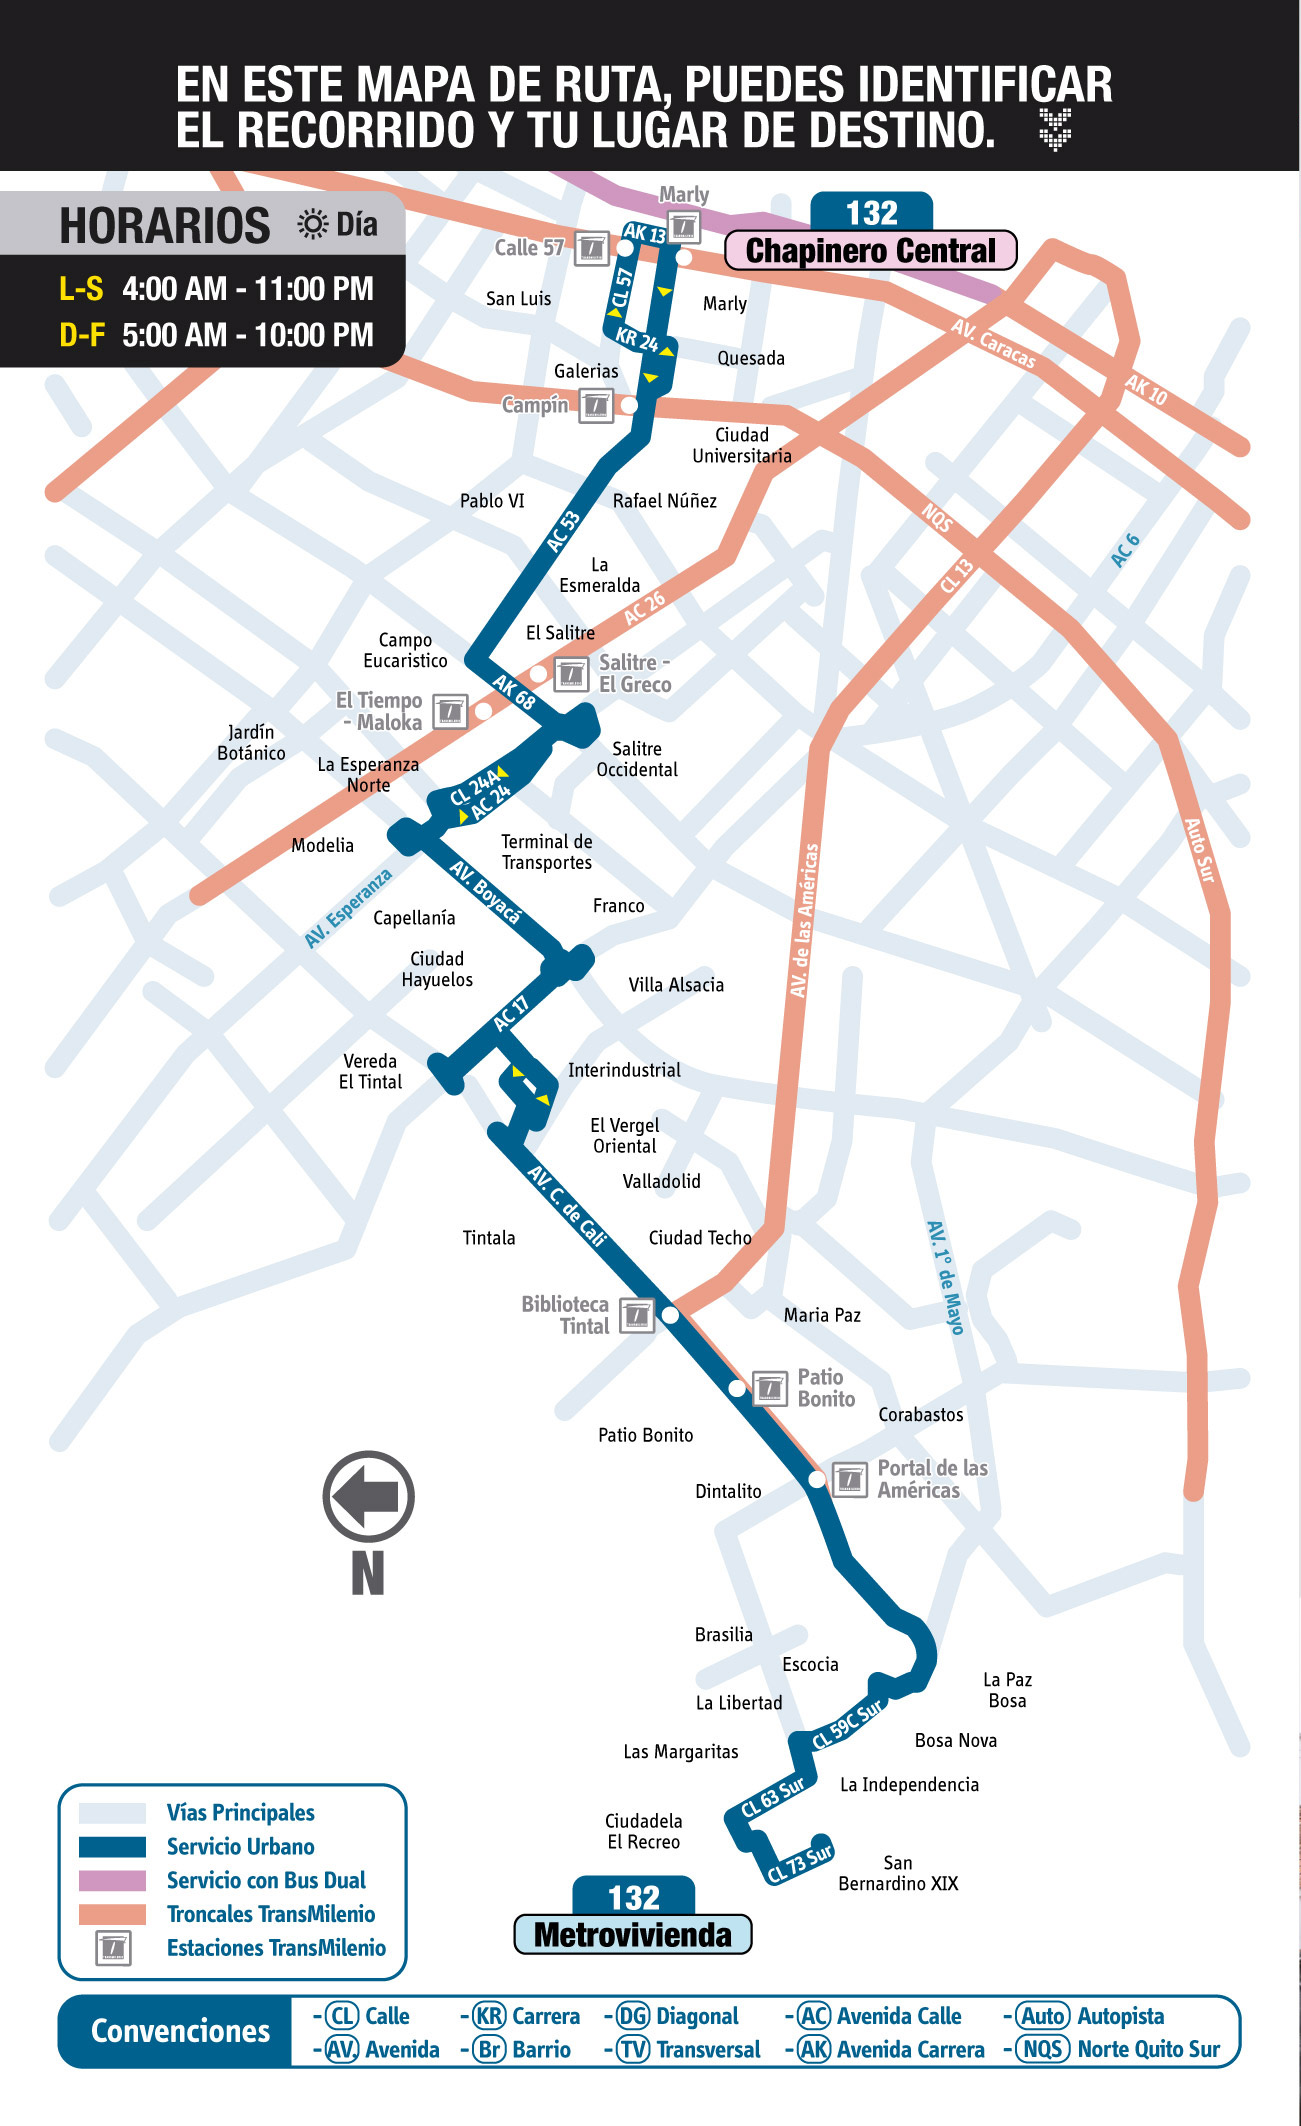 Mapa guía ruta 132 Metrovivienda - Chapinero Central